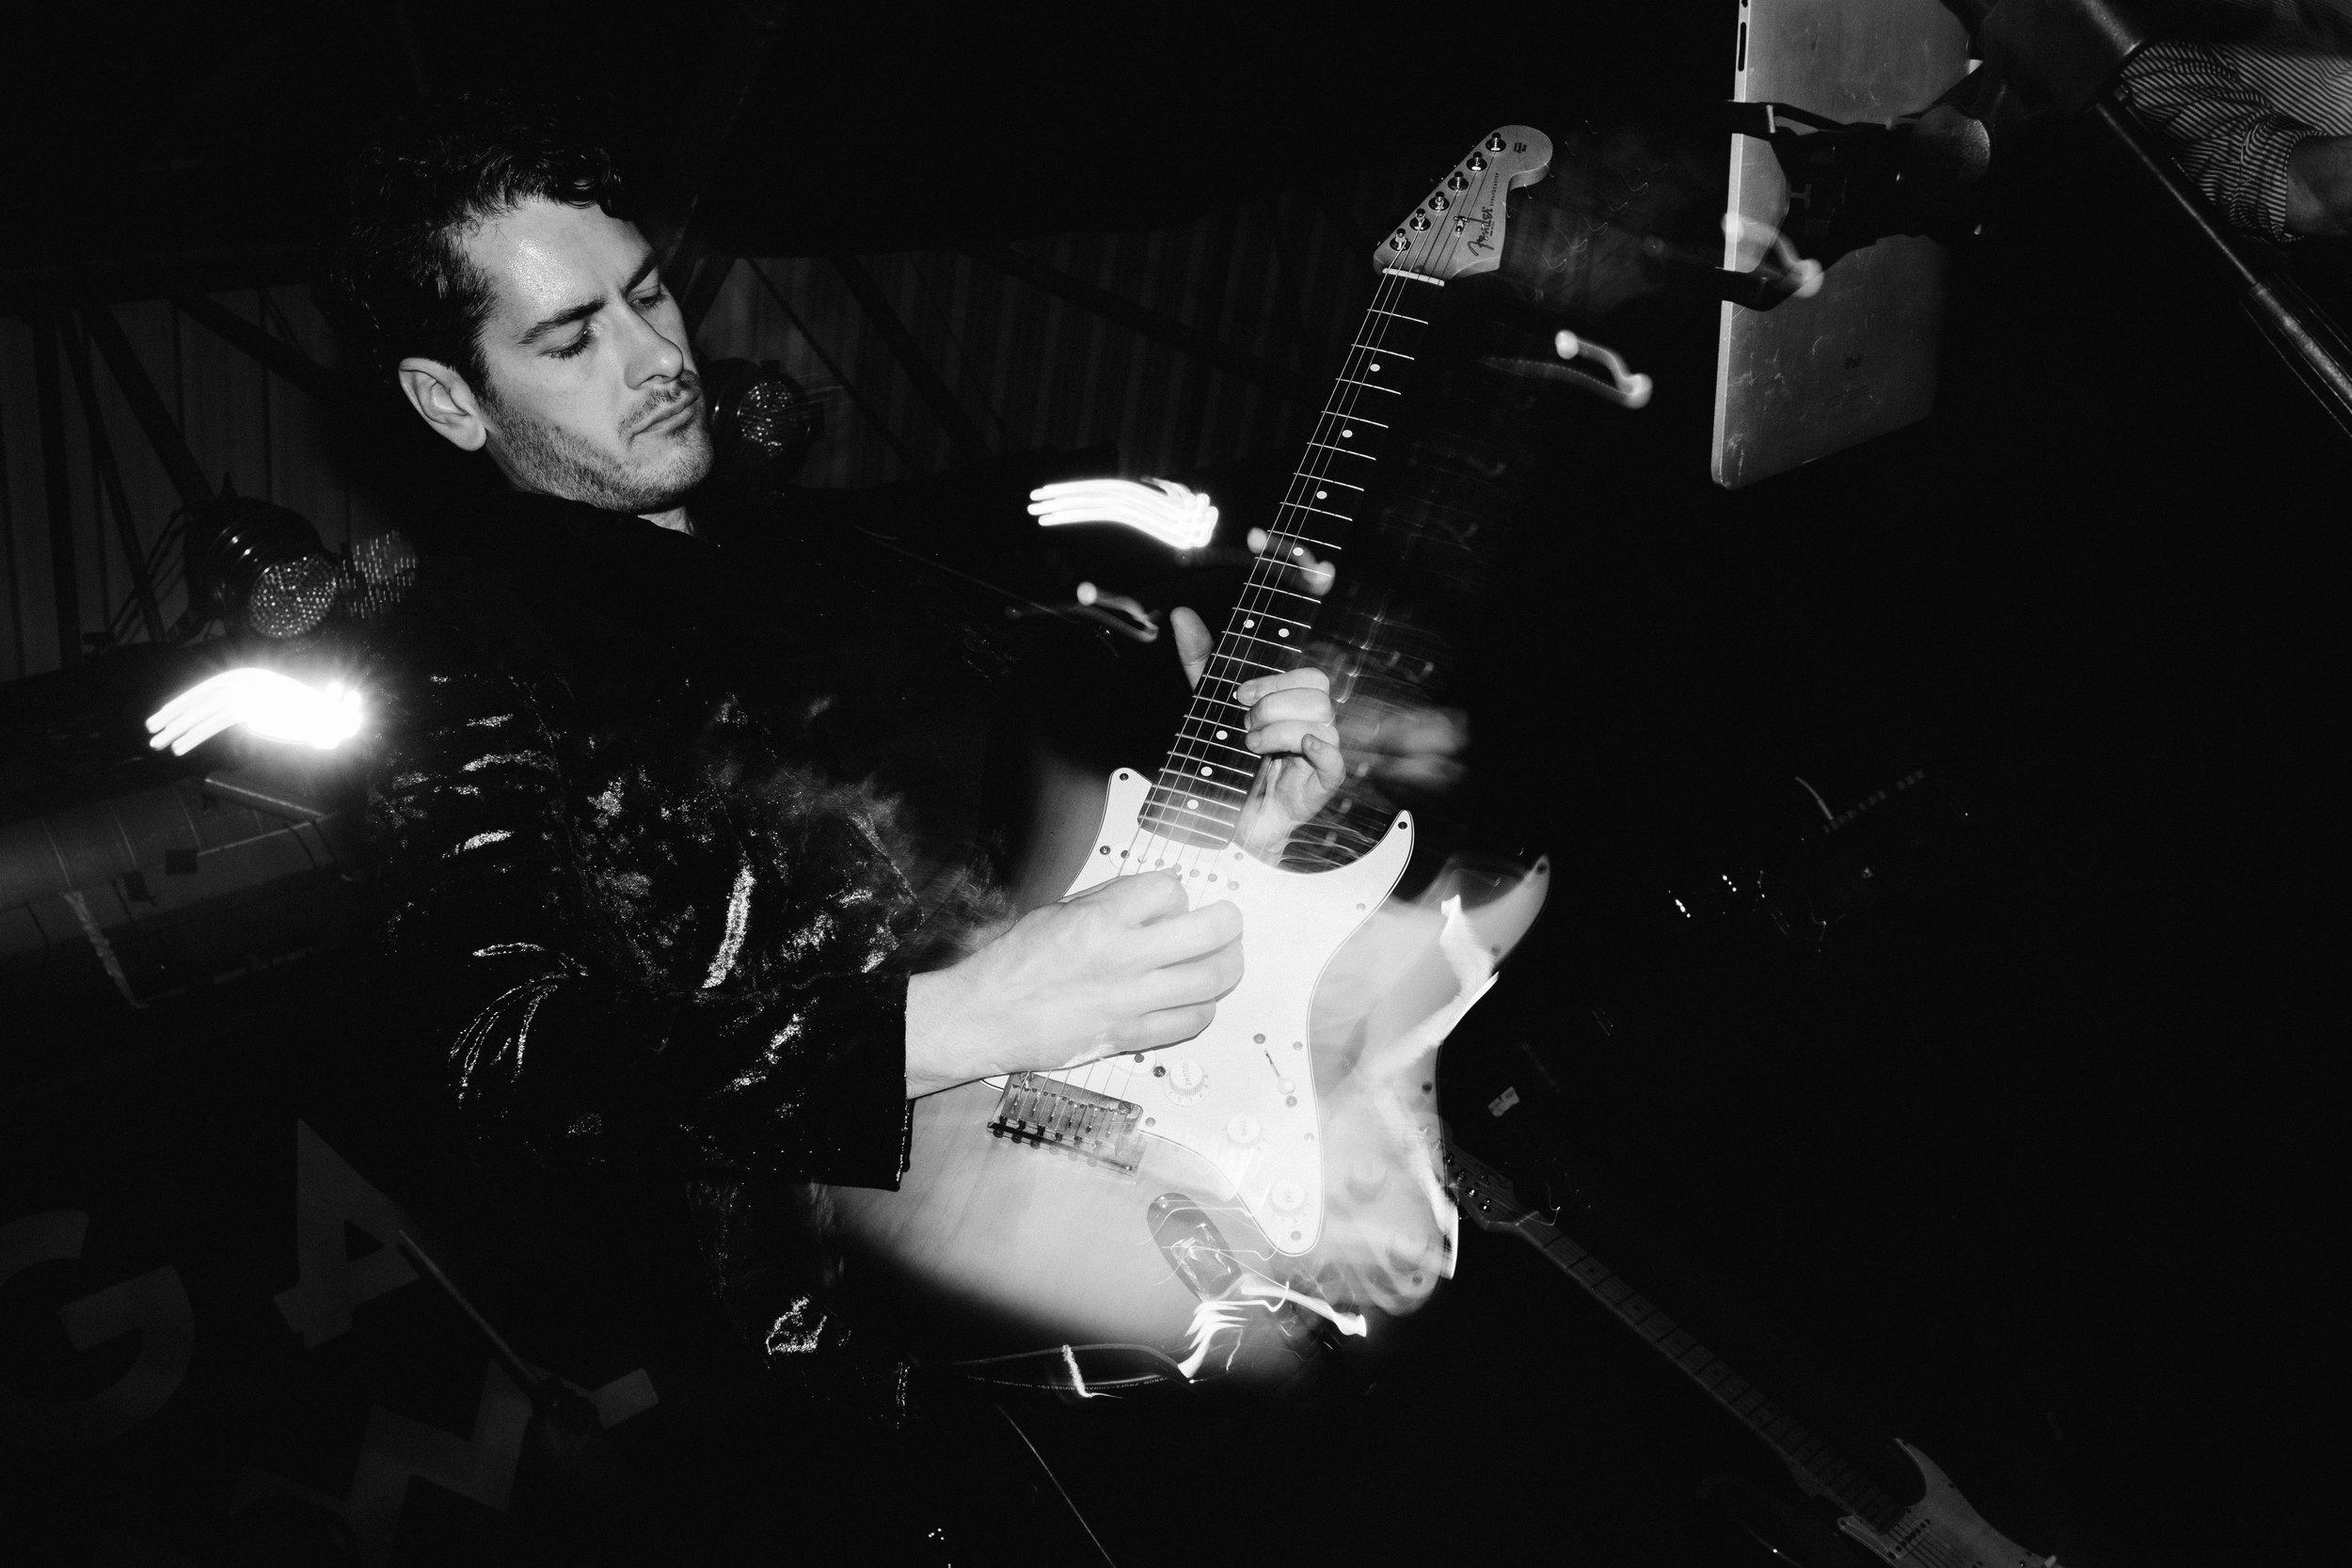 Nick-Bruce-Wedding-Band.jpg